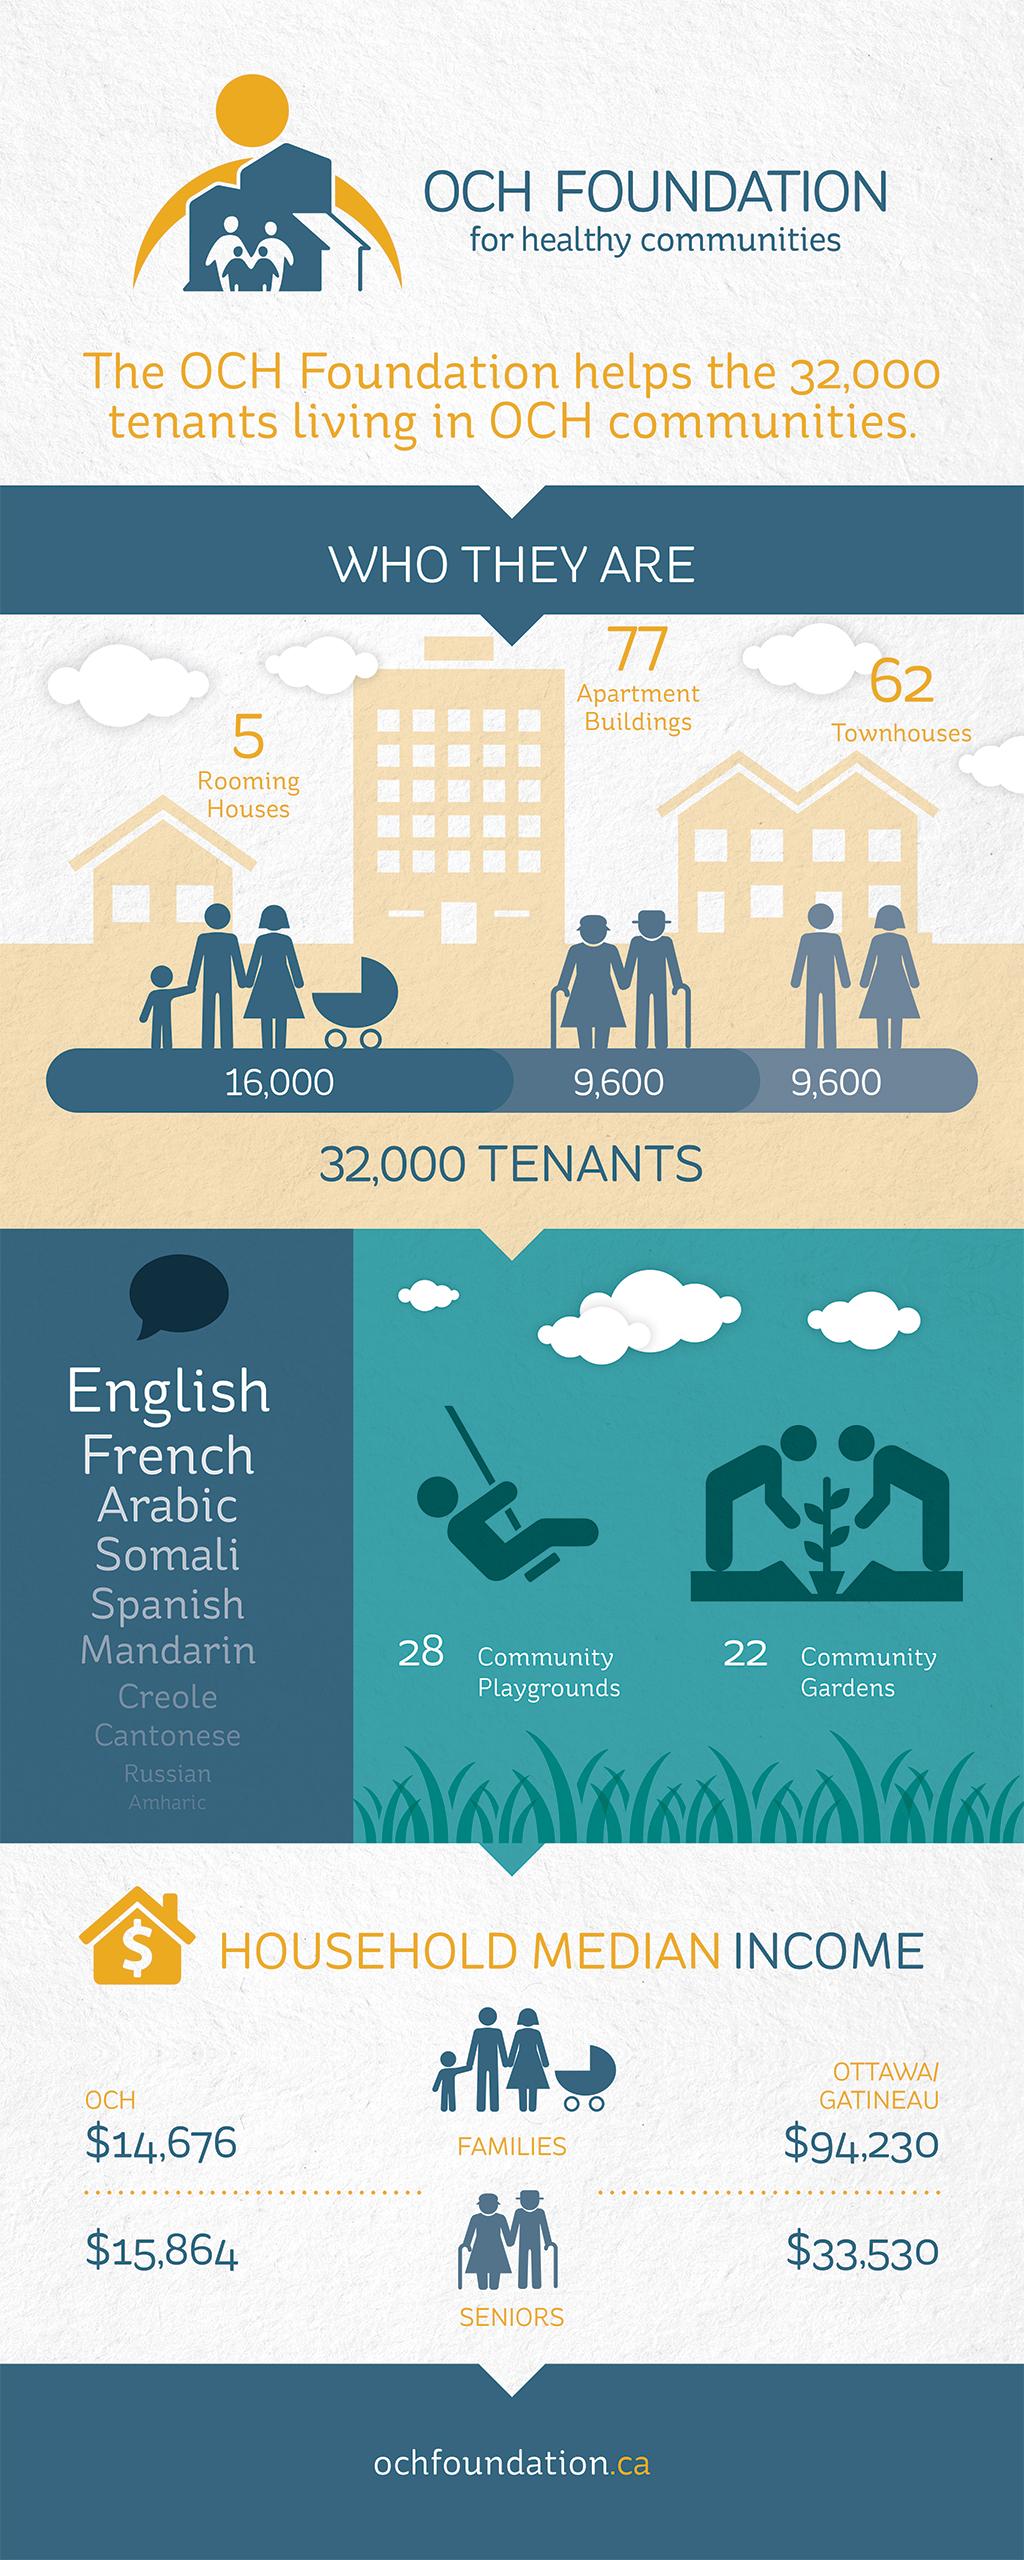 OCHF-Infographic_English